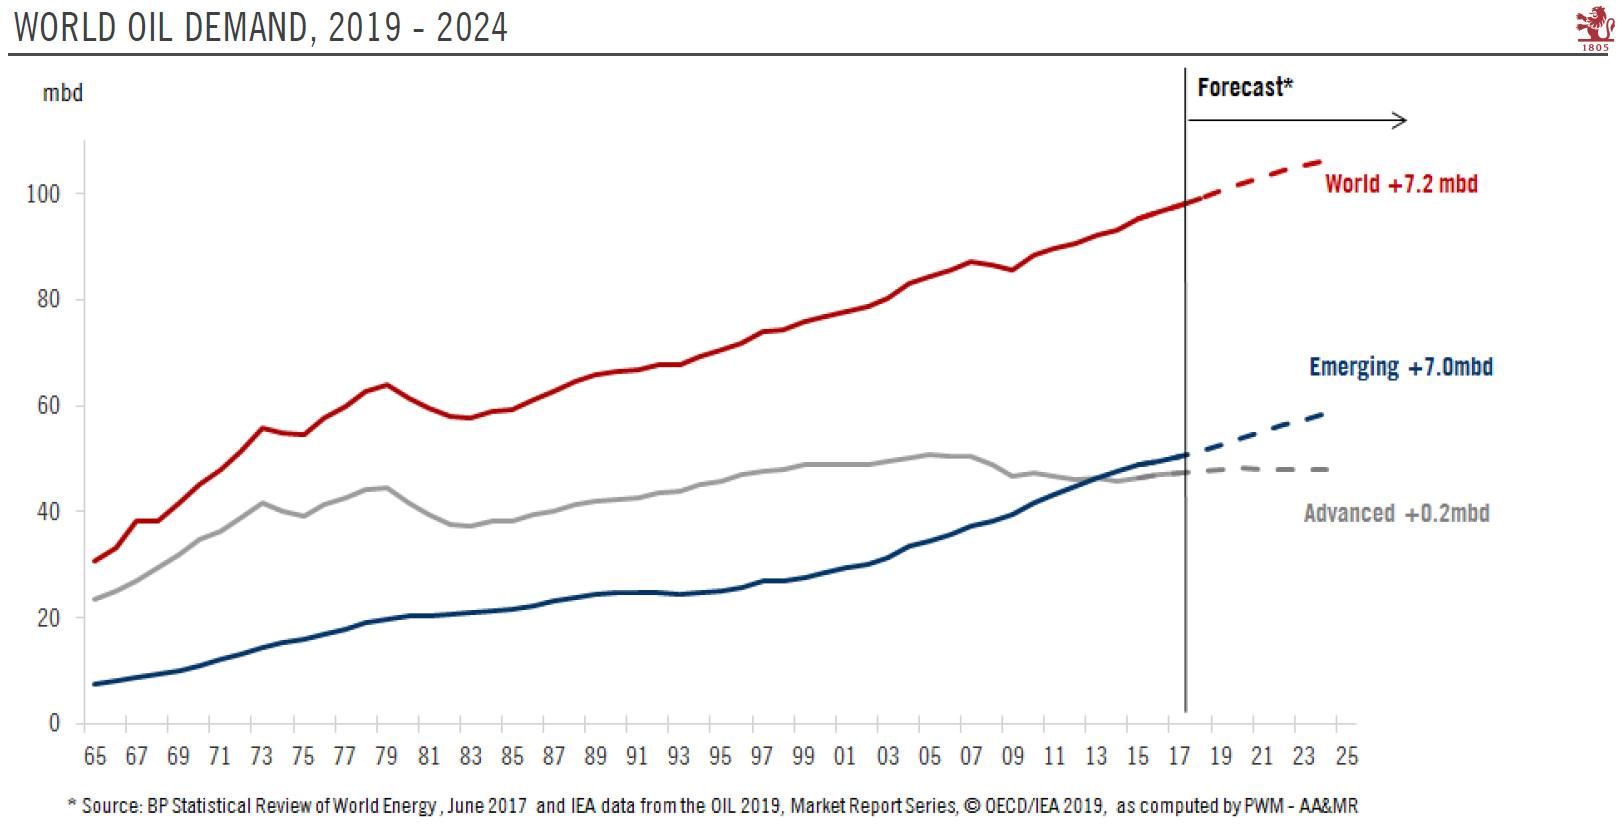 World Oil Demand, 2019-2024